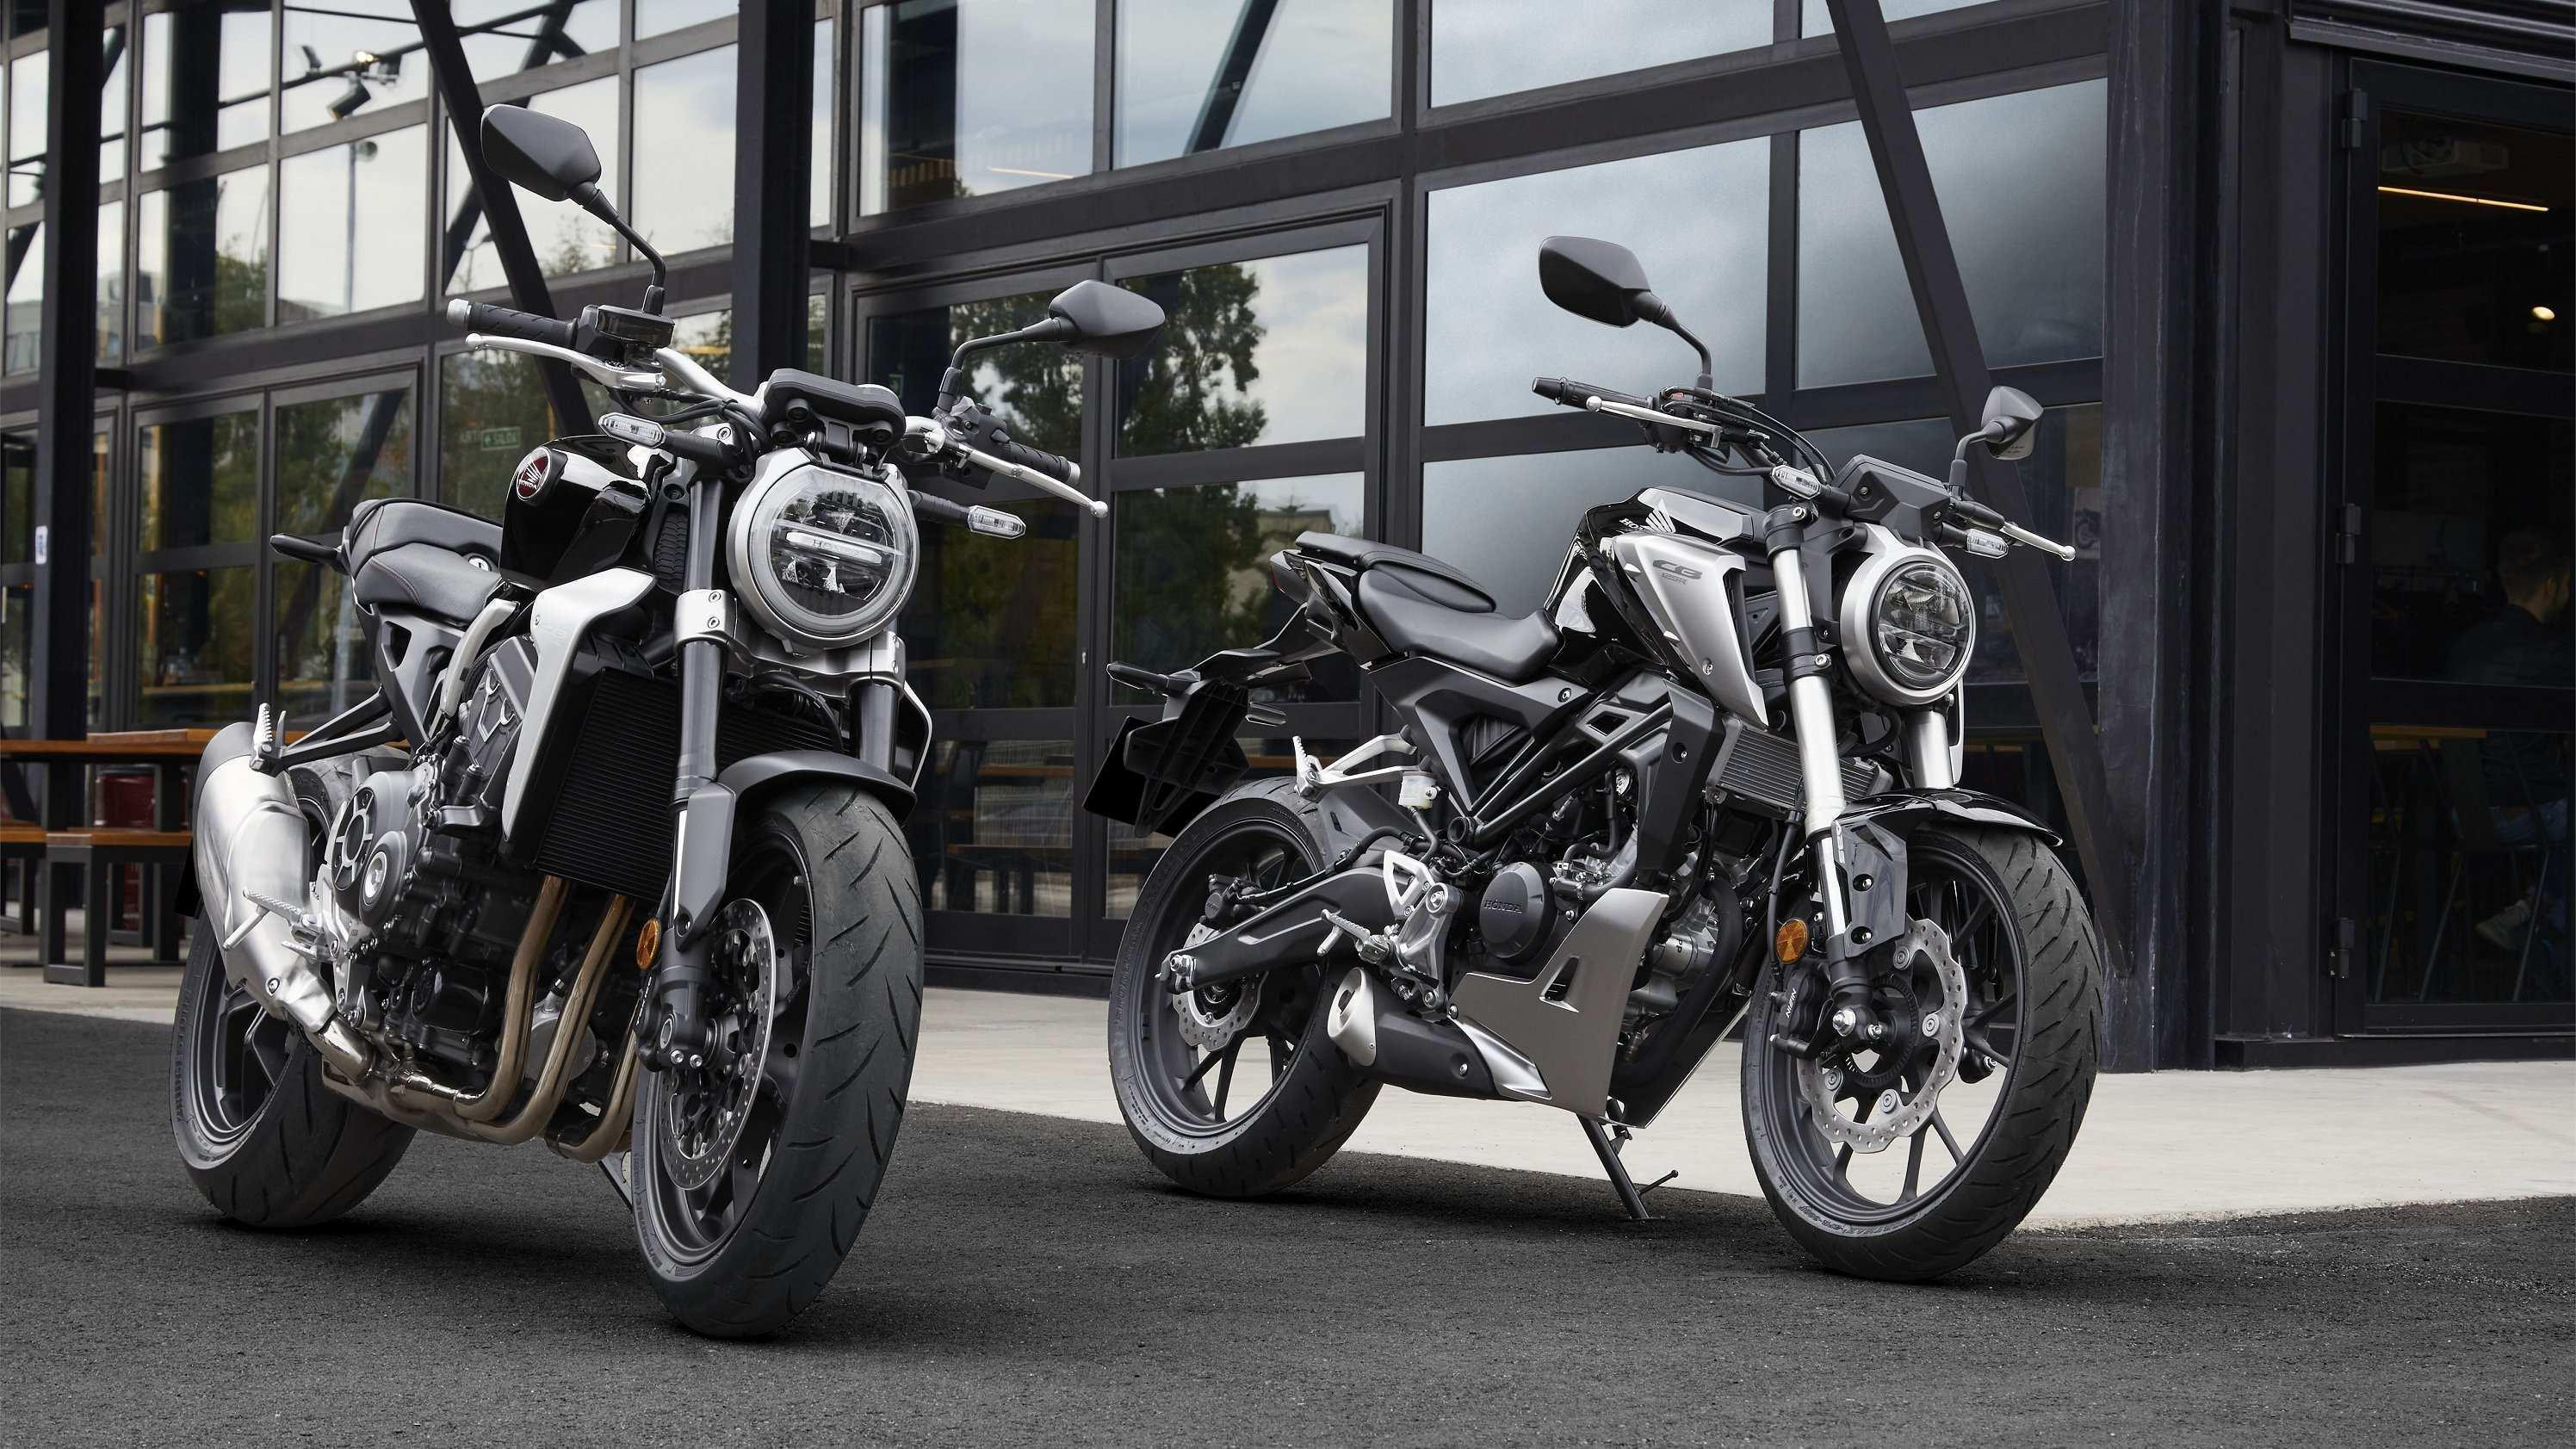 62 Gallery of 2019 Honda 300 Configurations for 2019 Honda 300